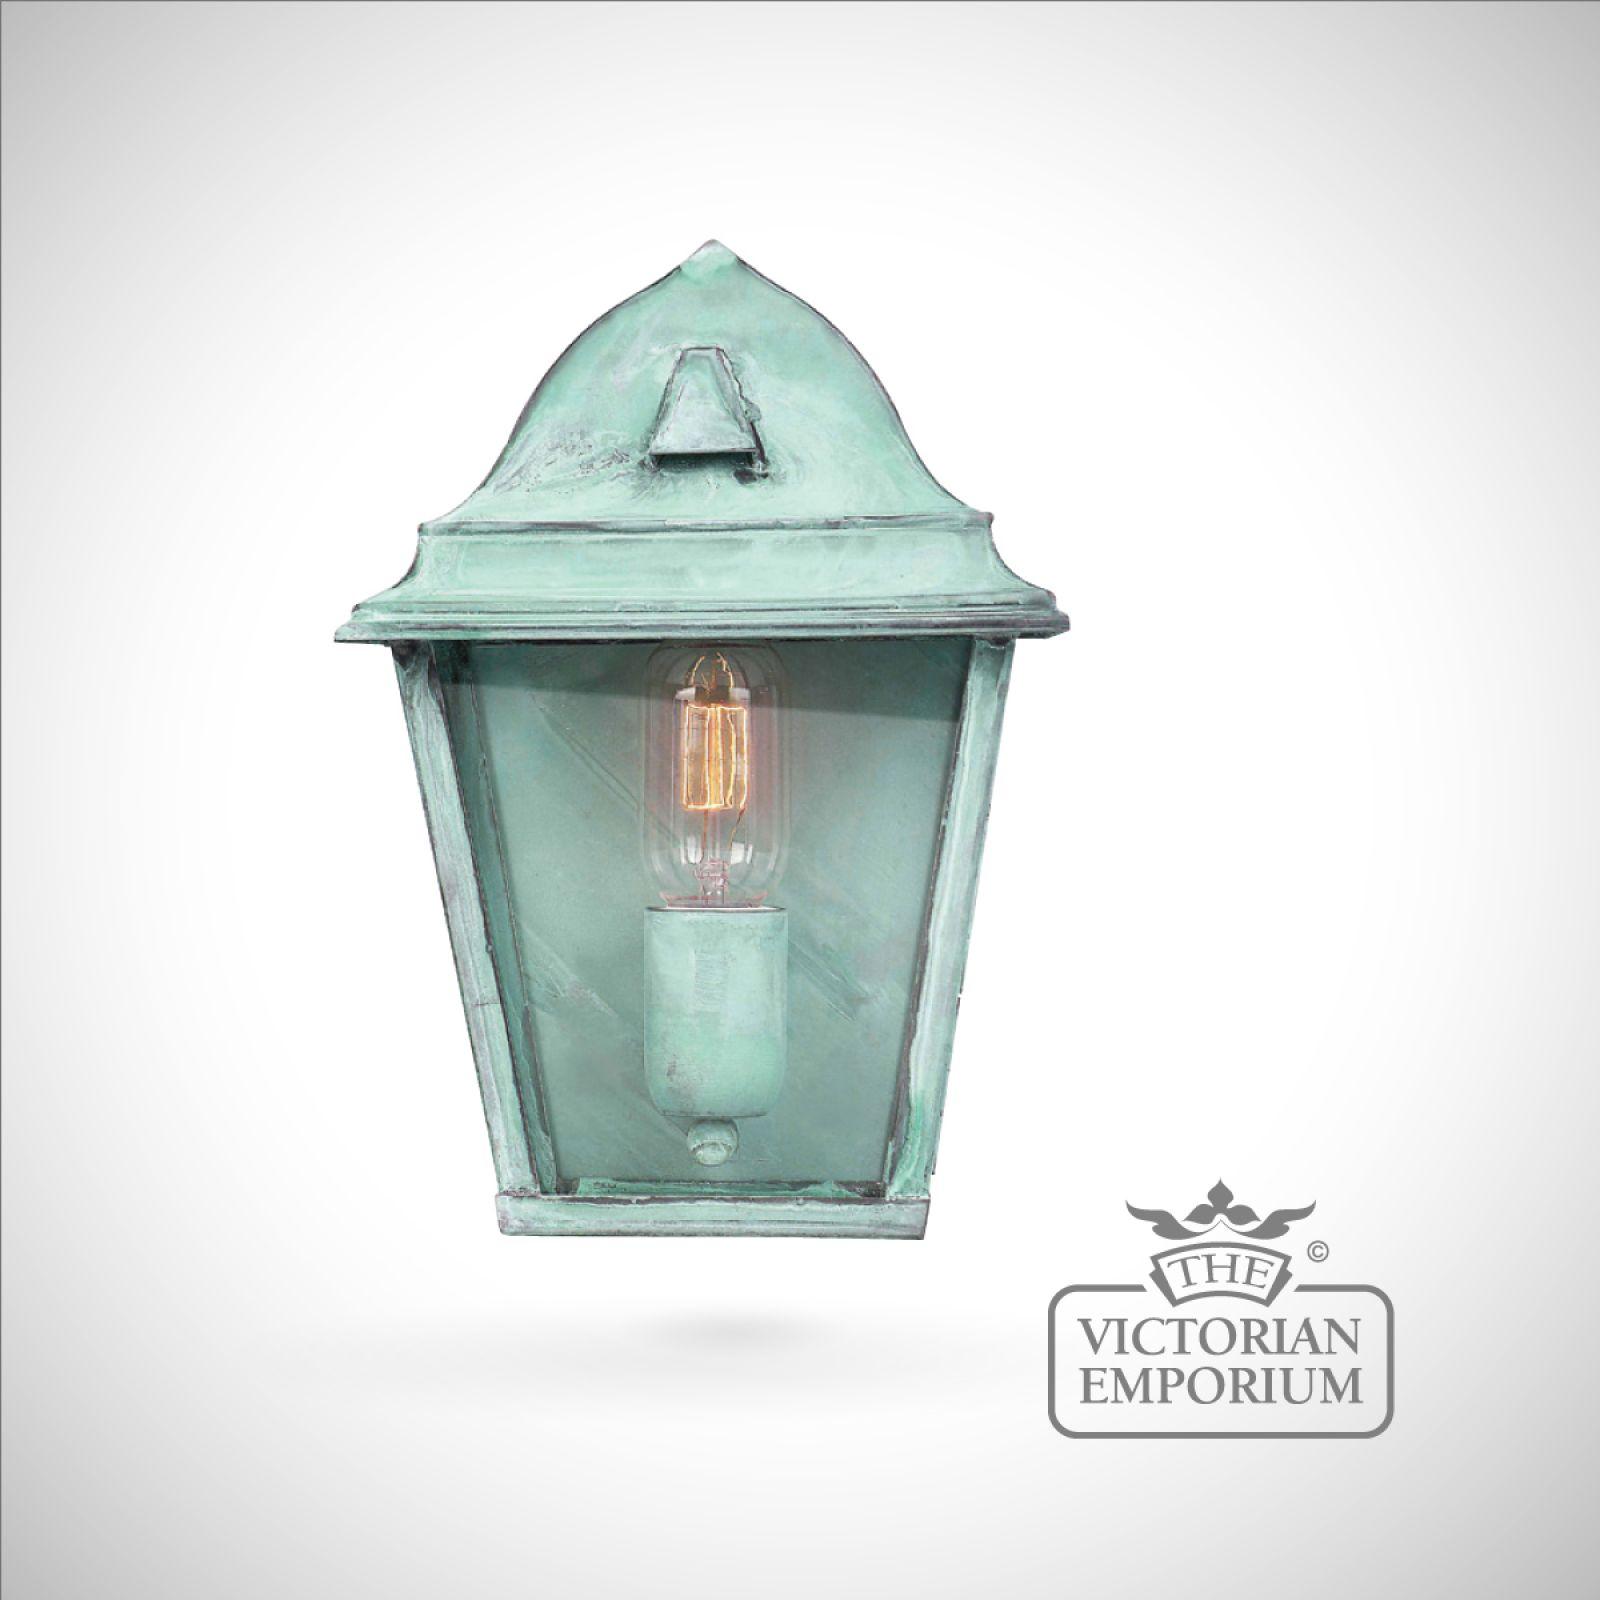 St james brass wall lantern vert outdoor wall lights for Victorian style exterior lighting